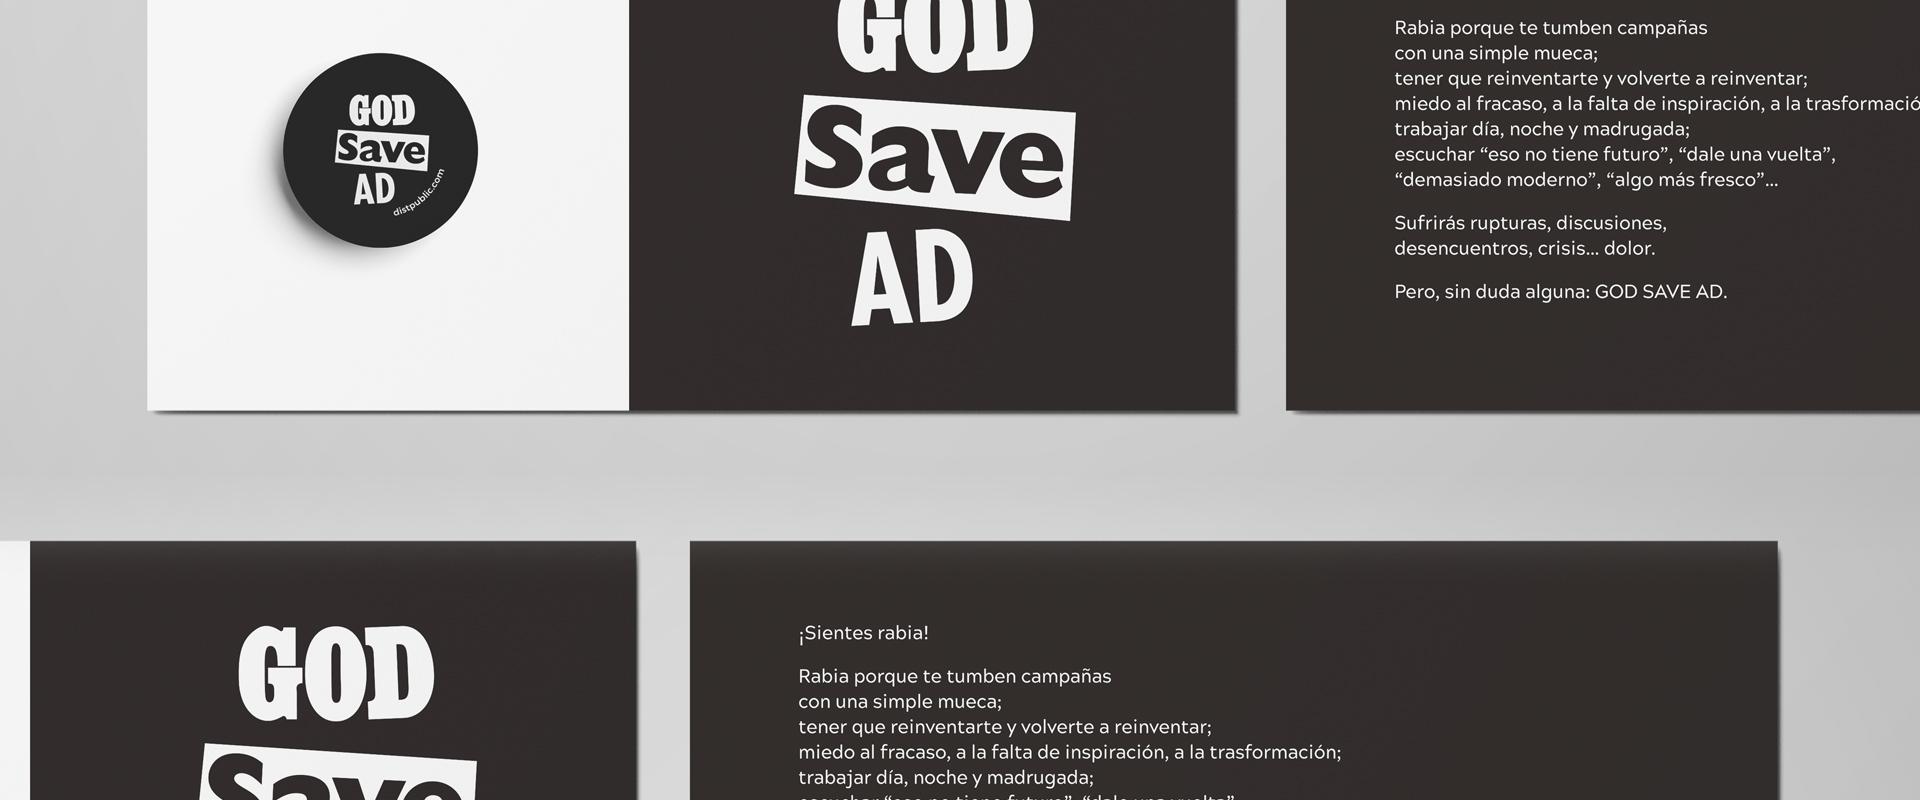 flyer_god-save-ad